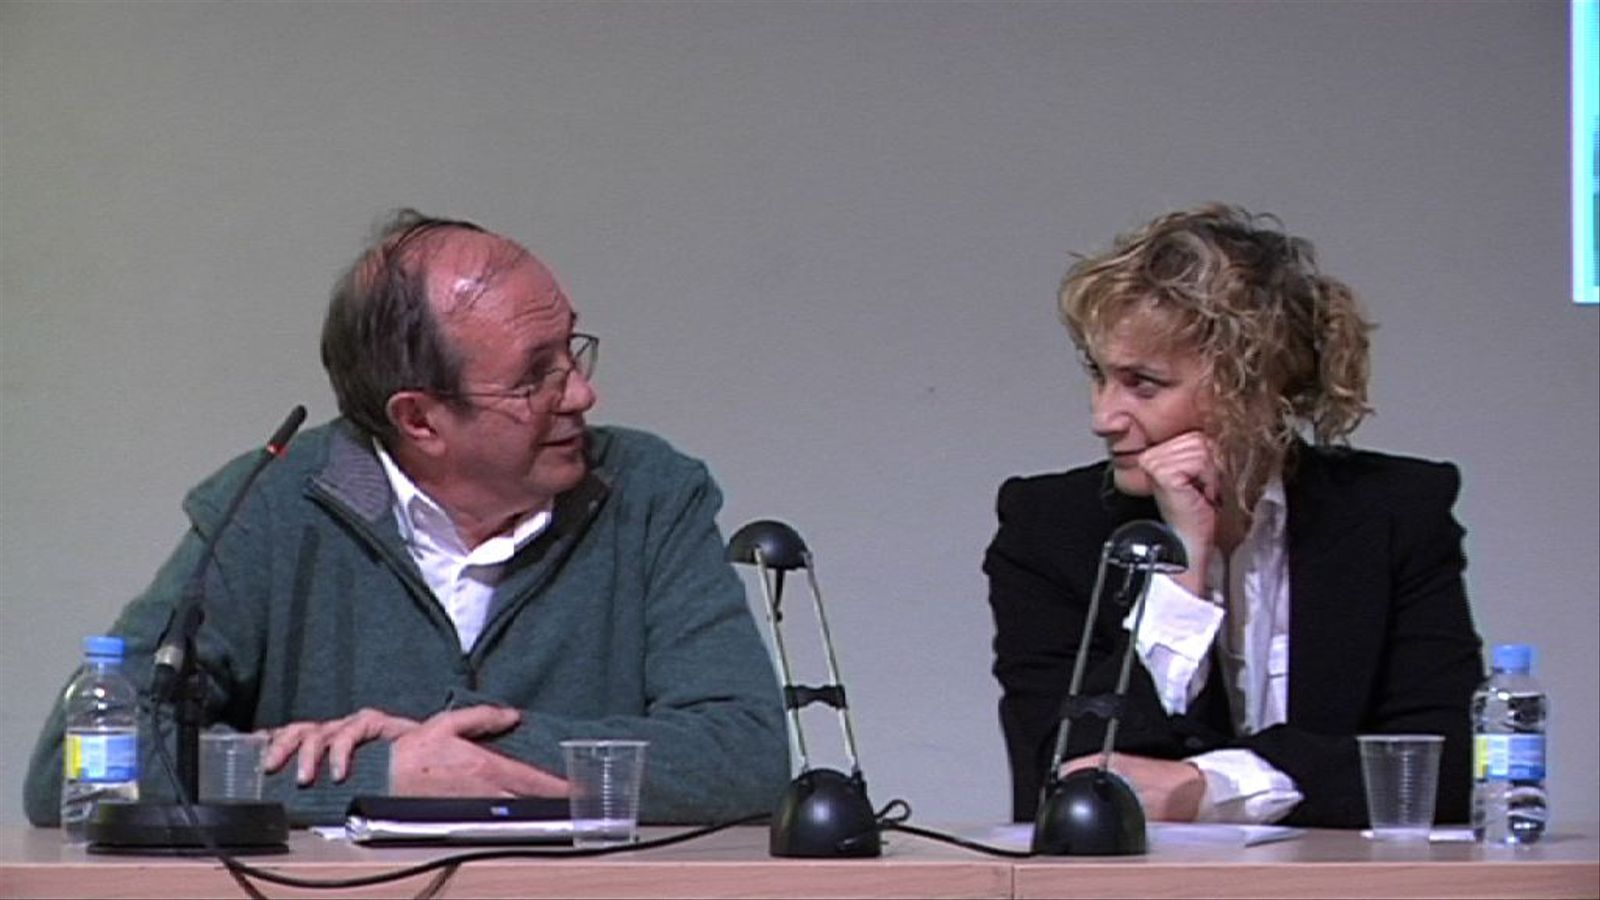 Jaume Cela a Mònica Terribas: Jo a l'escola dono ciutadania i avui he sabut que sóc mestre d'adoctrinament